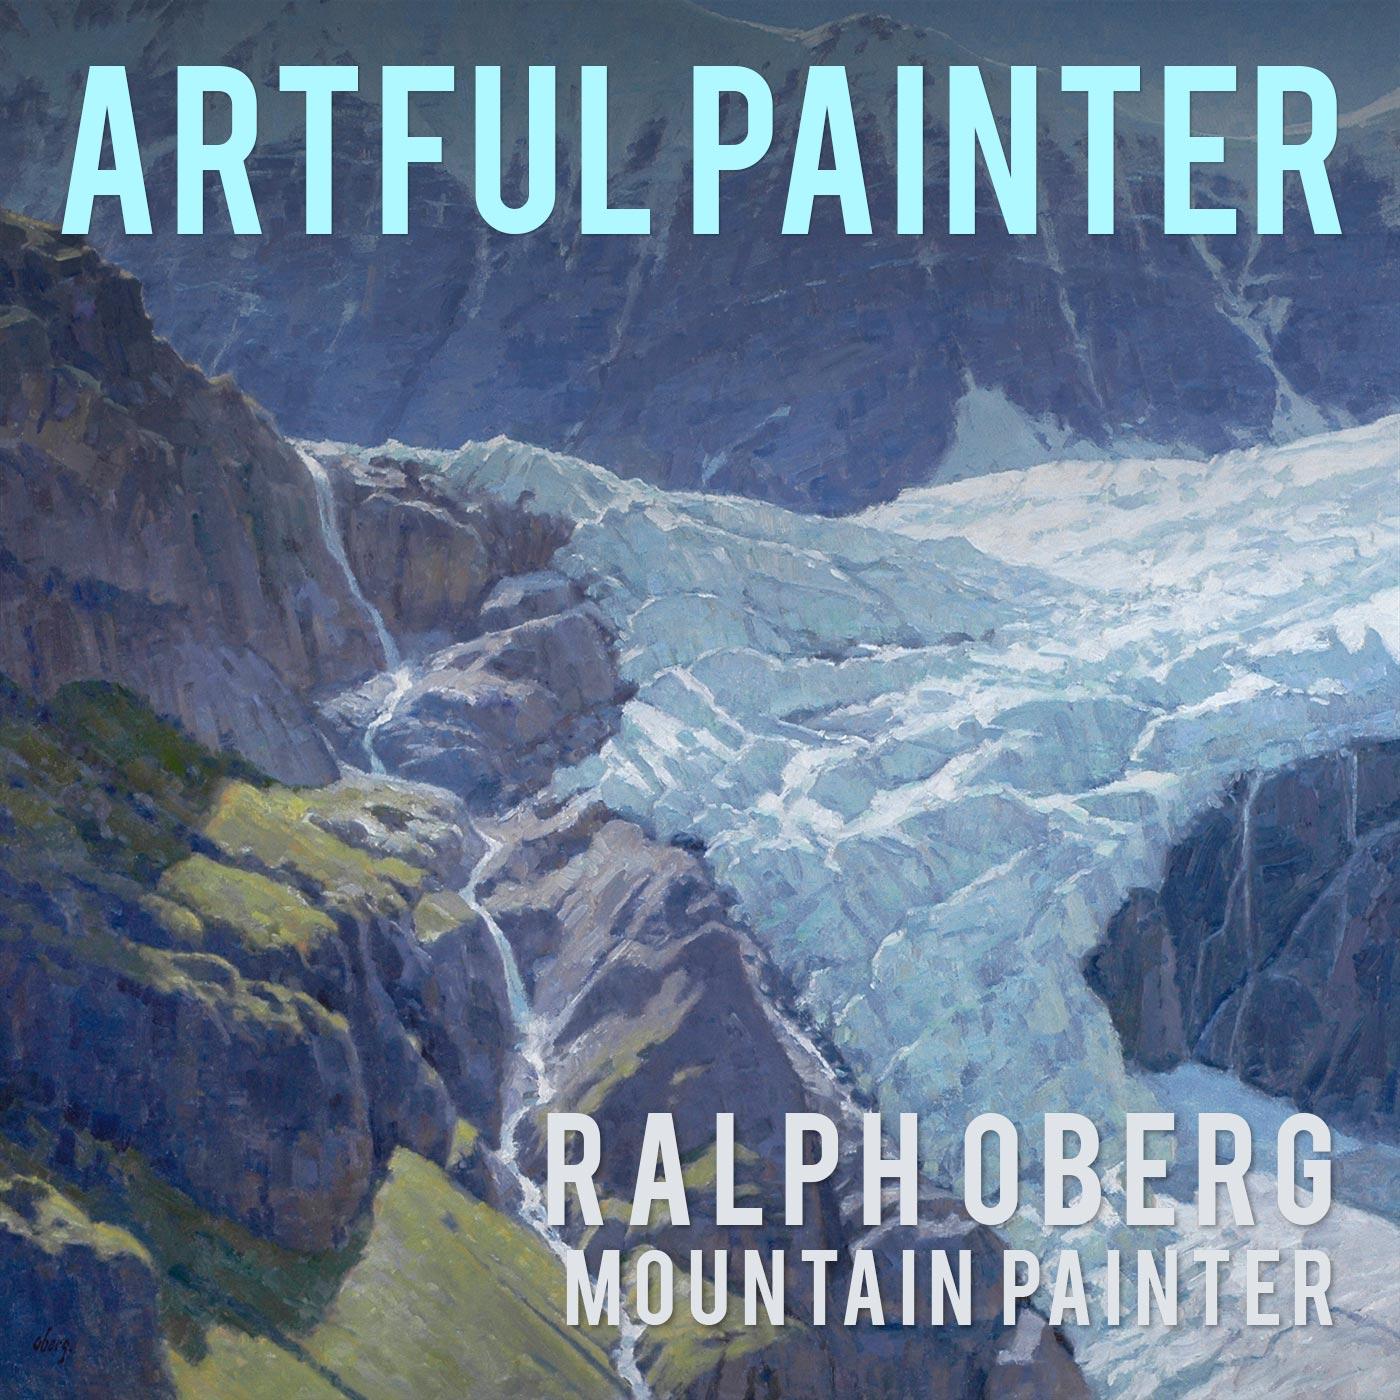 artful-painter-ralph-oberg.jpg